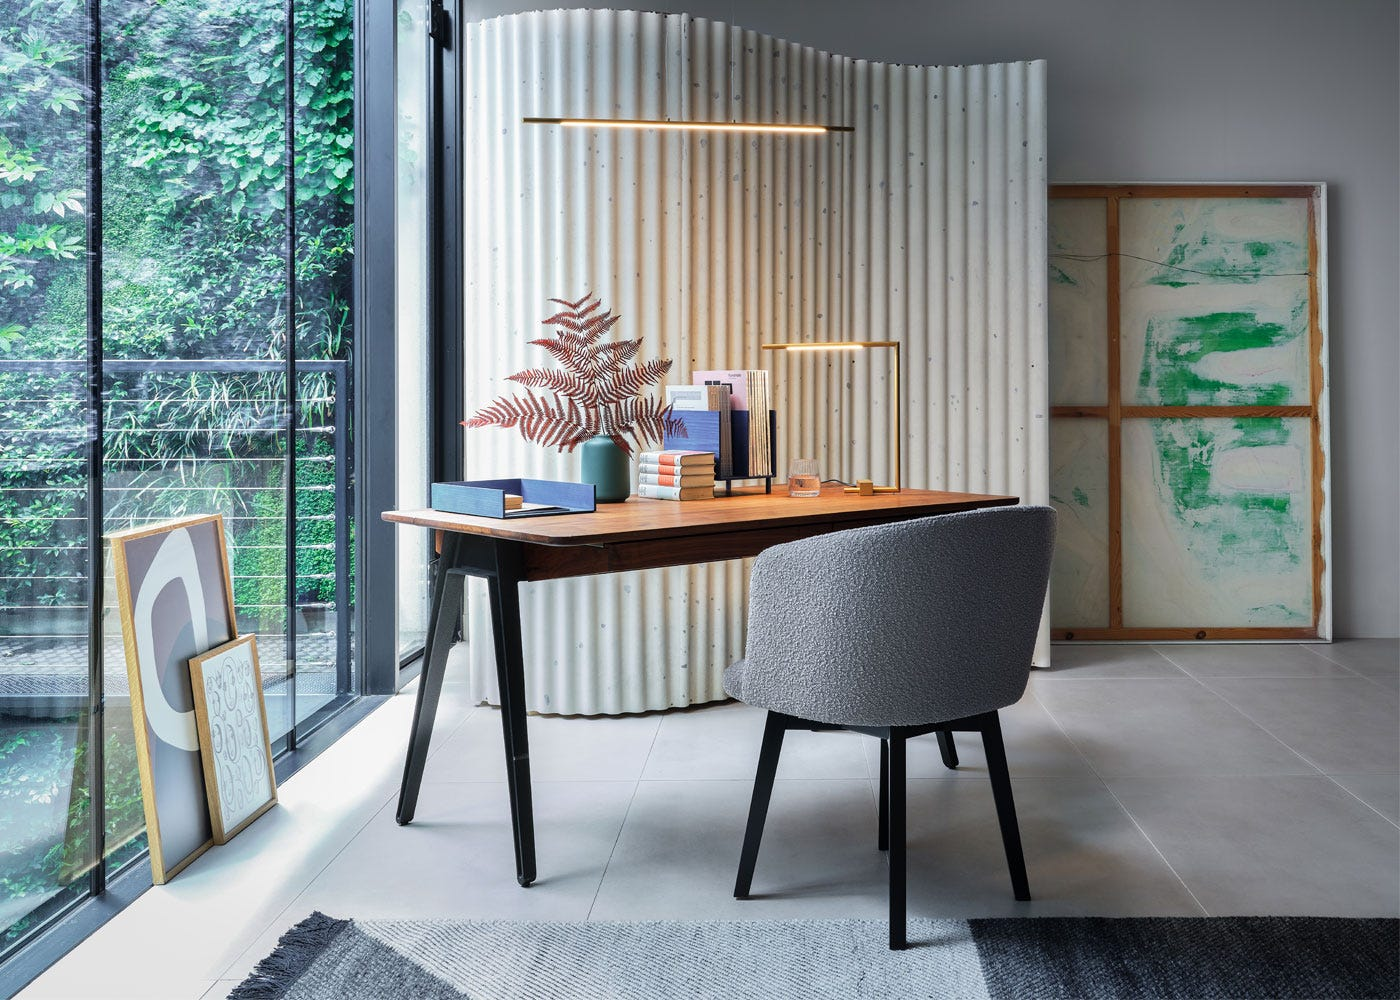 As shown: Edit swivel chair, Orson desk walnut, Saber LED desk lamp brass